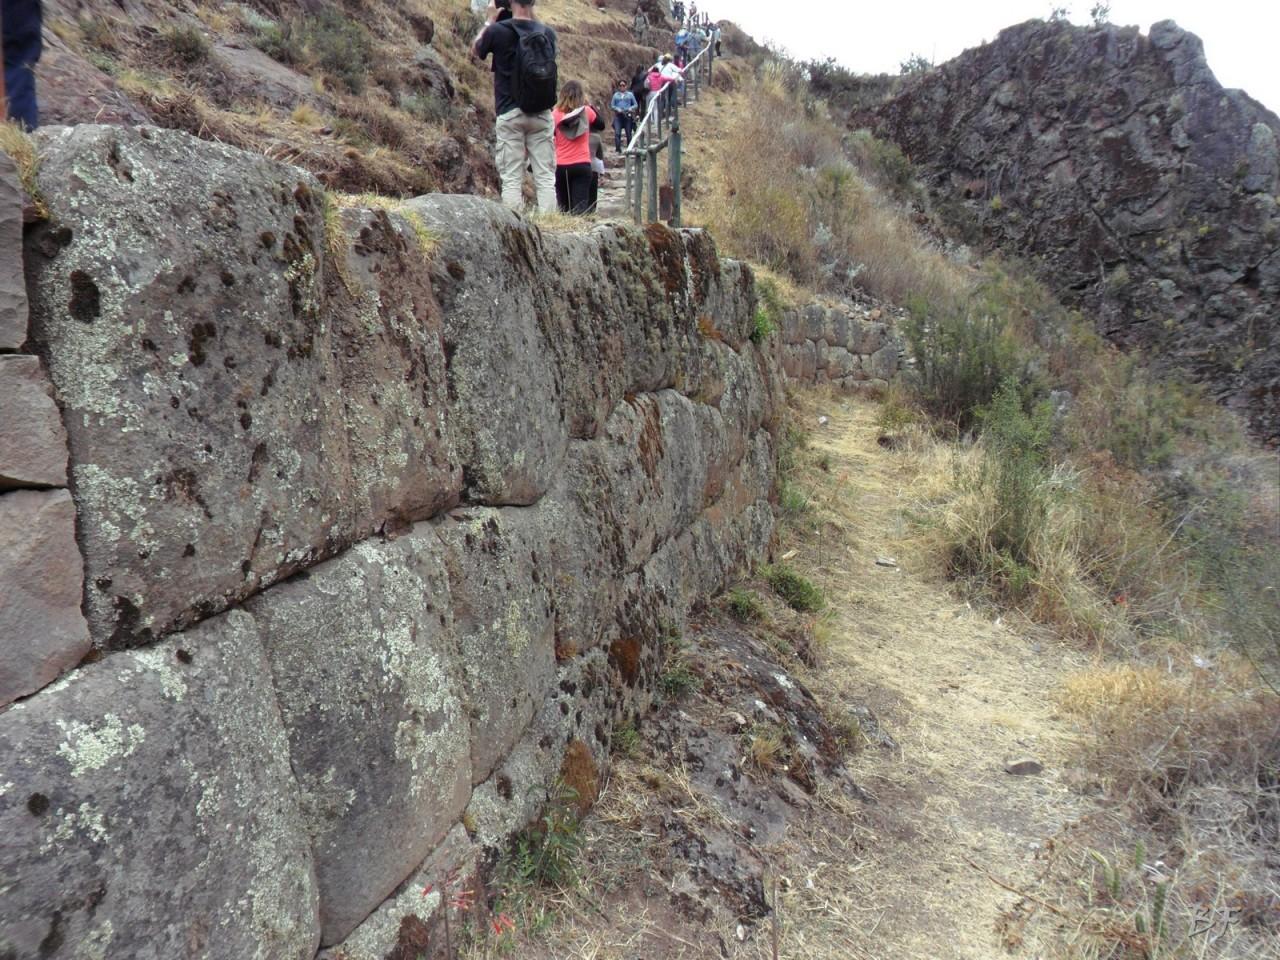 Mura-Poligonali-Megaliti-Altari-Rupestri-Pisac-Cusco-Perù-12